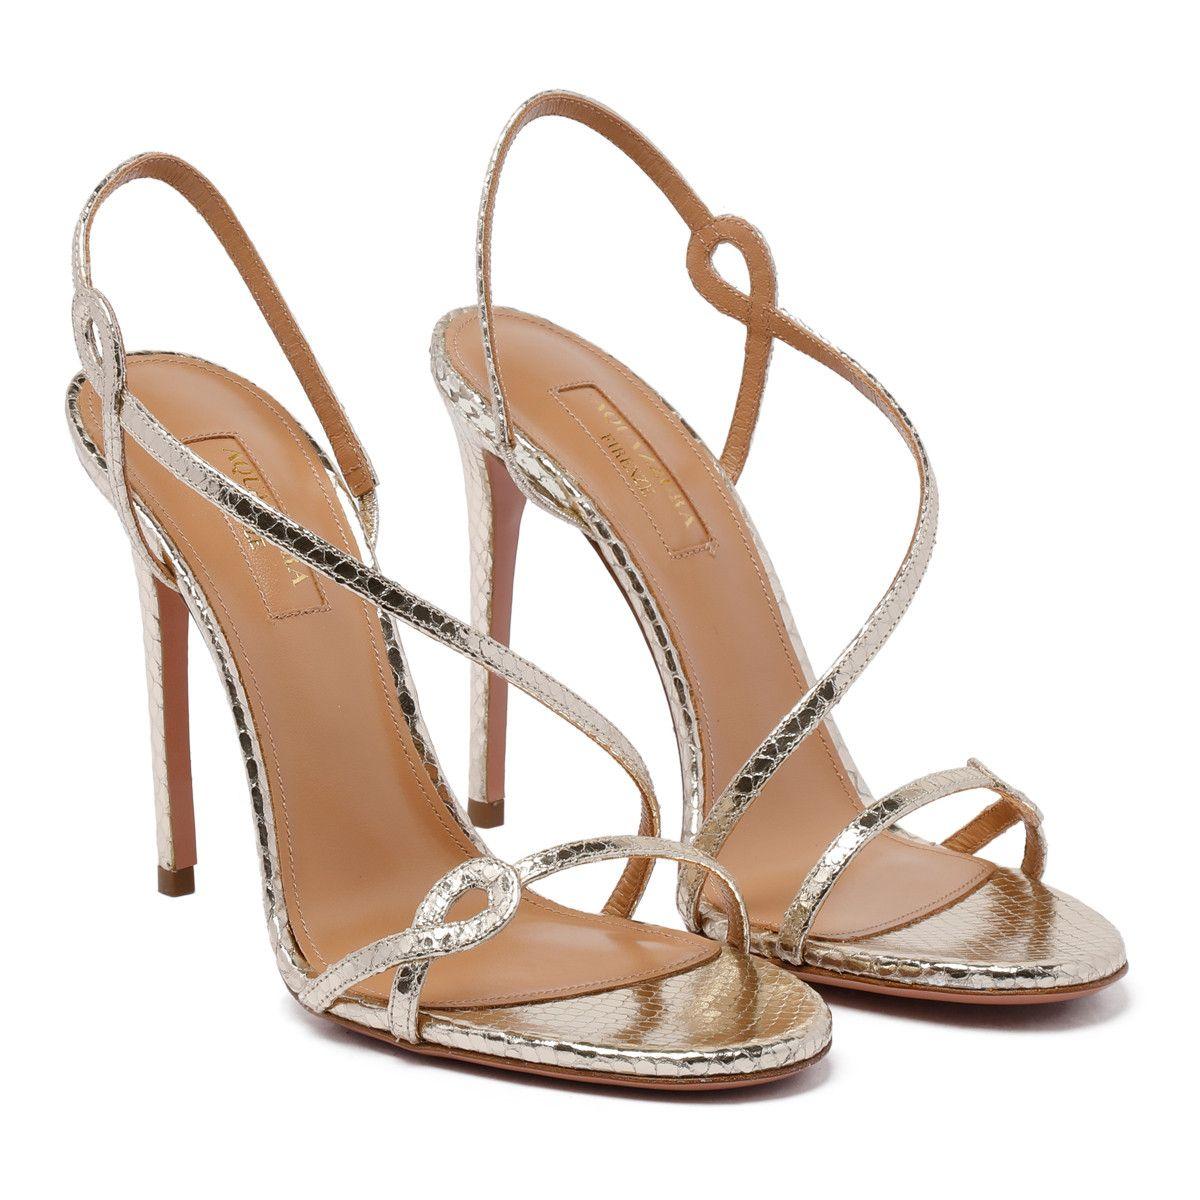 Https Www Antonia It Us Stnhigs0 Mts Ccc Stnhigs0 Mts Ccc Html Golden Sandals Gold Heels Stiletto Heels